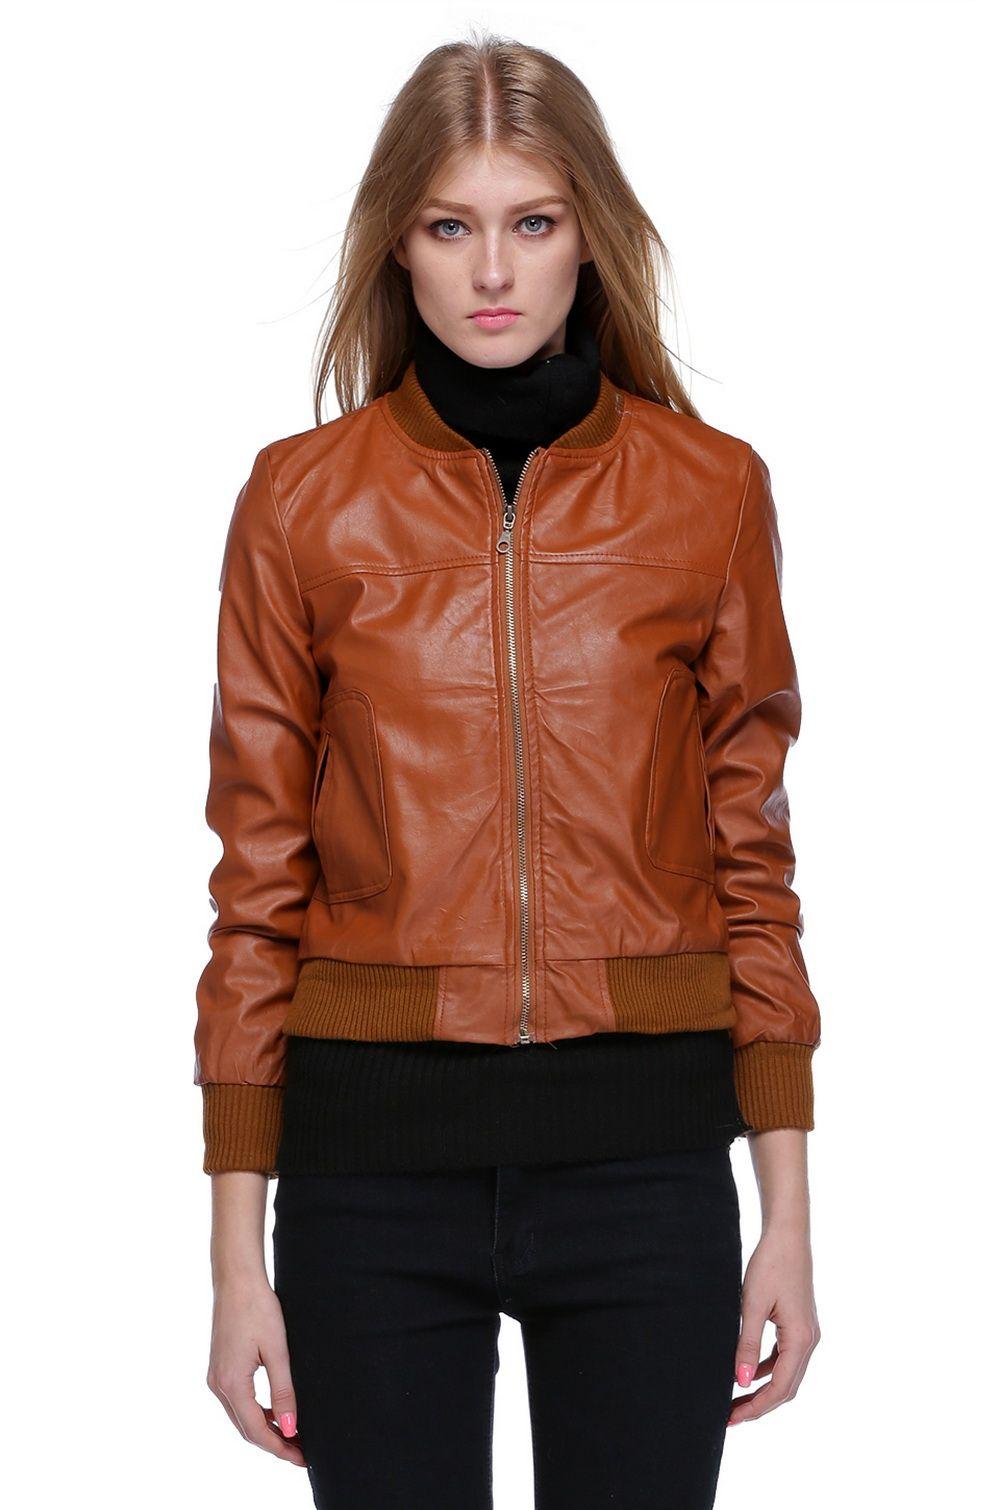 Girls Brown Leather Jacket   Fit Jacket